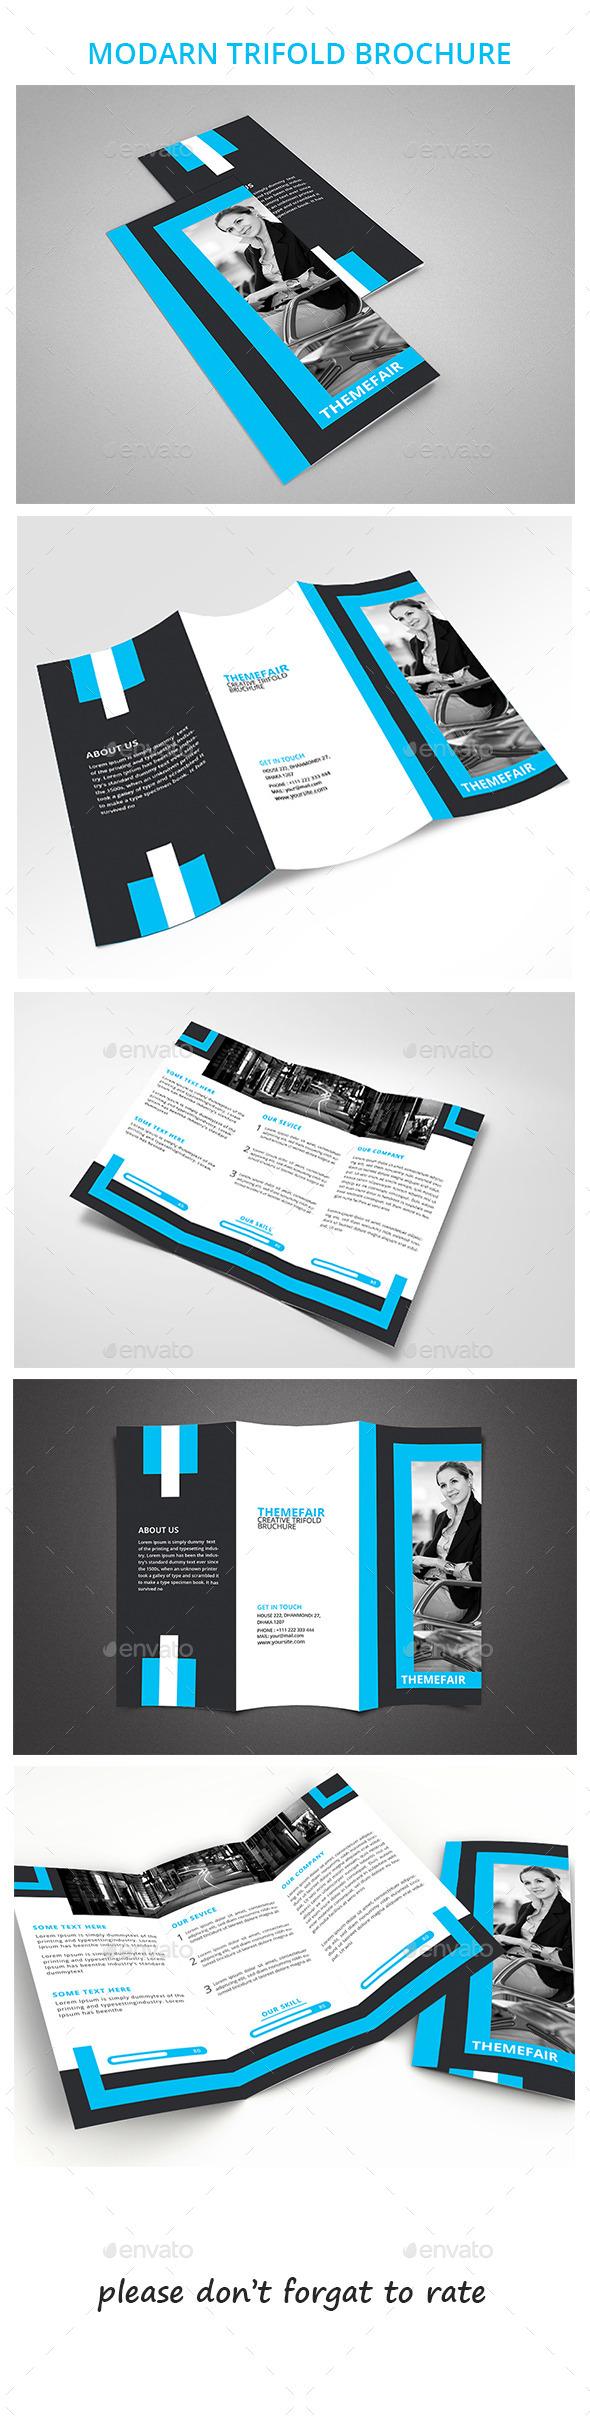 GraphicRiver Mordan Trifold Brochure 10156324